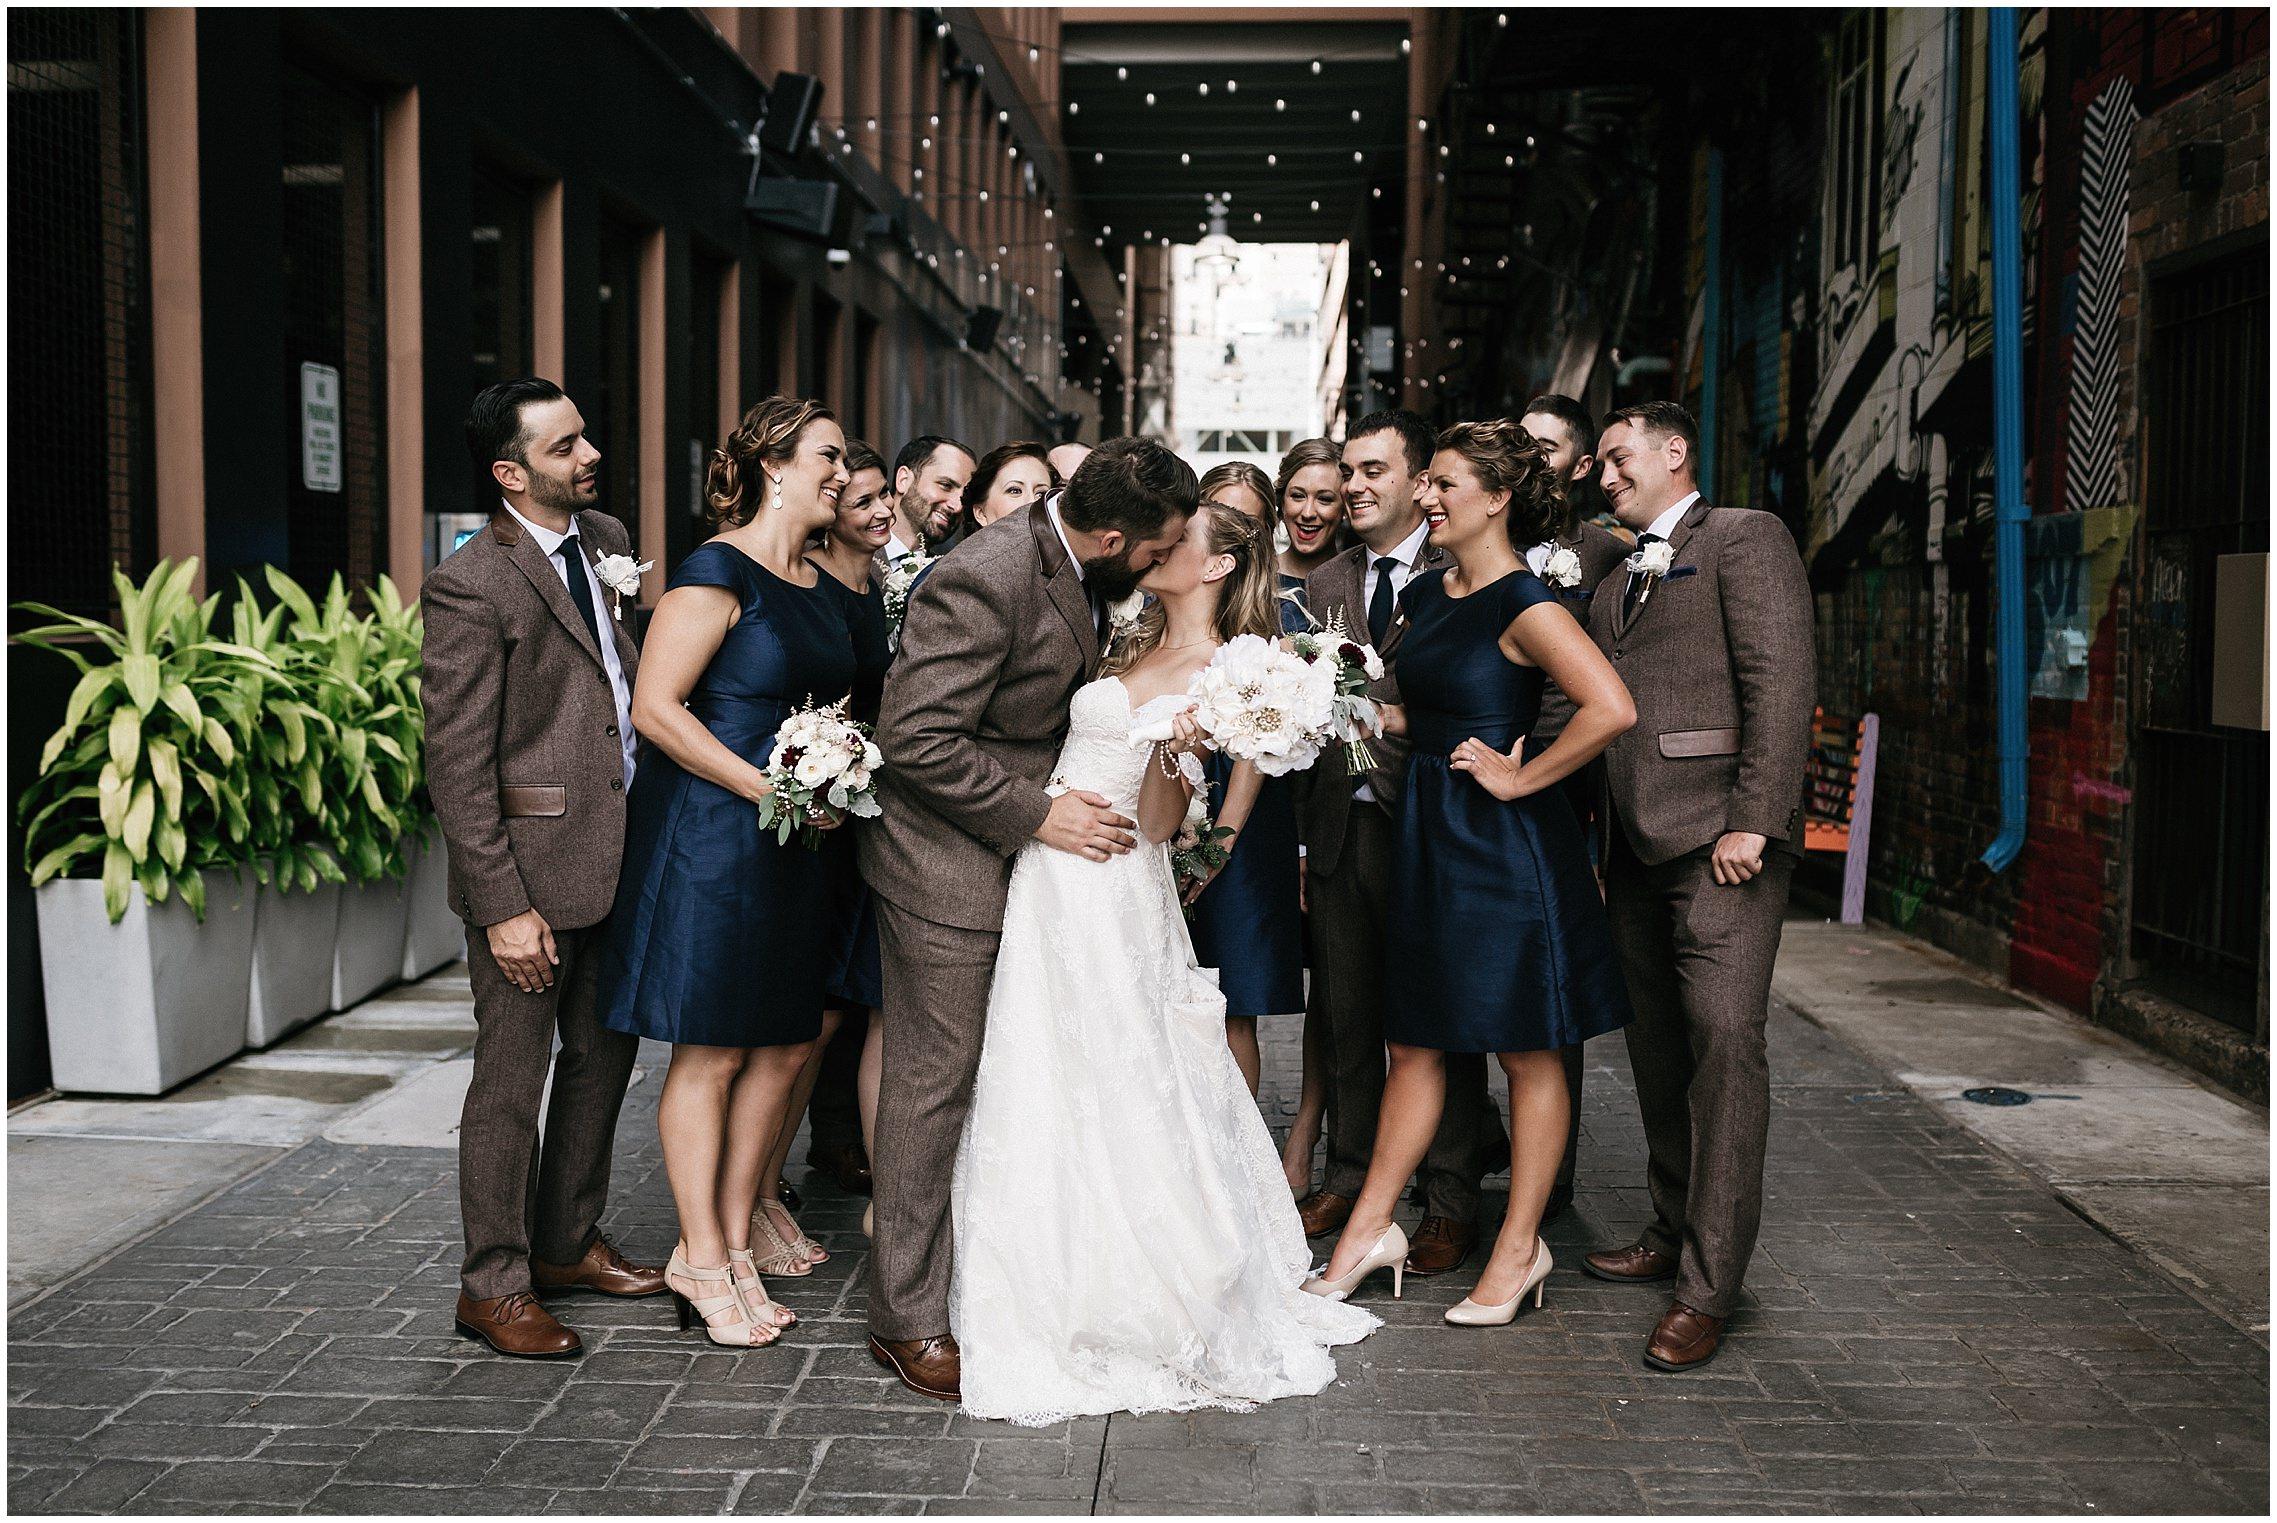 brick_and_mortar_colorado_wedding_photographer_0255.jpg